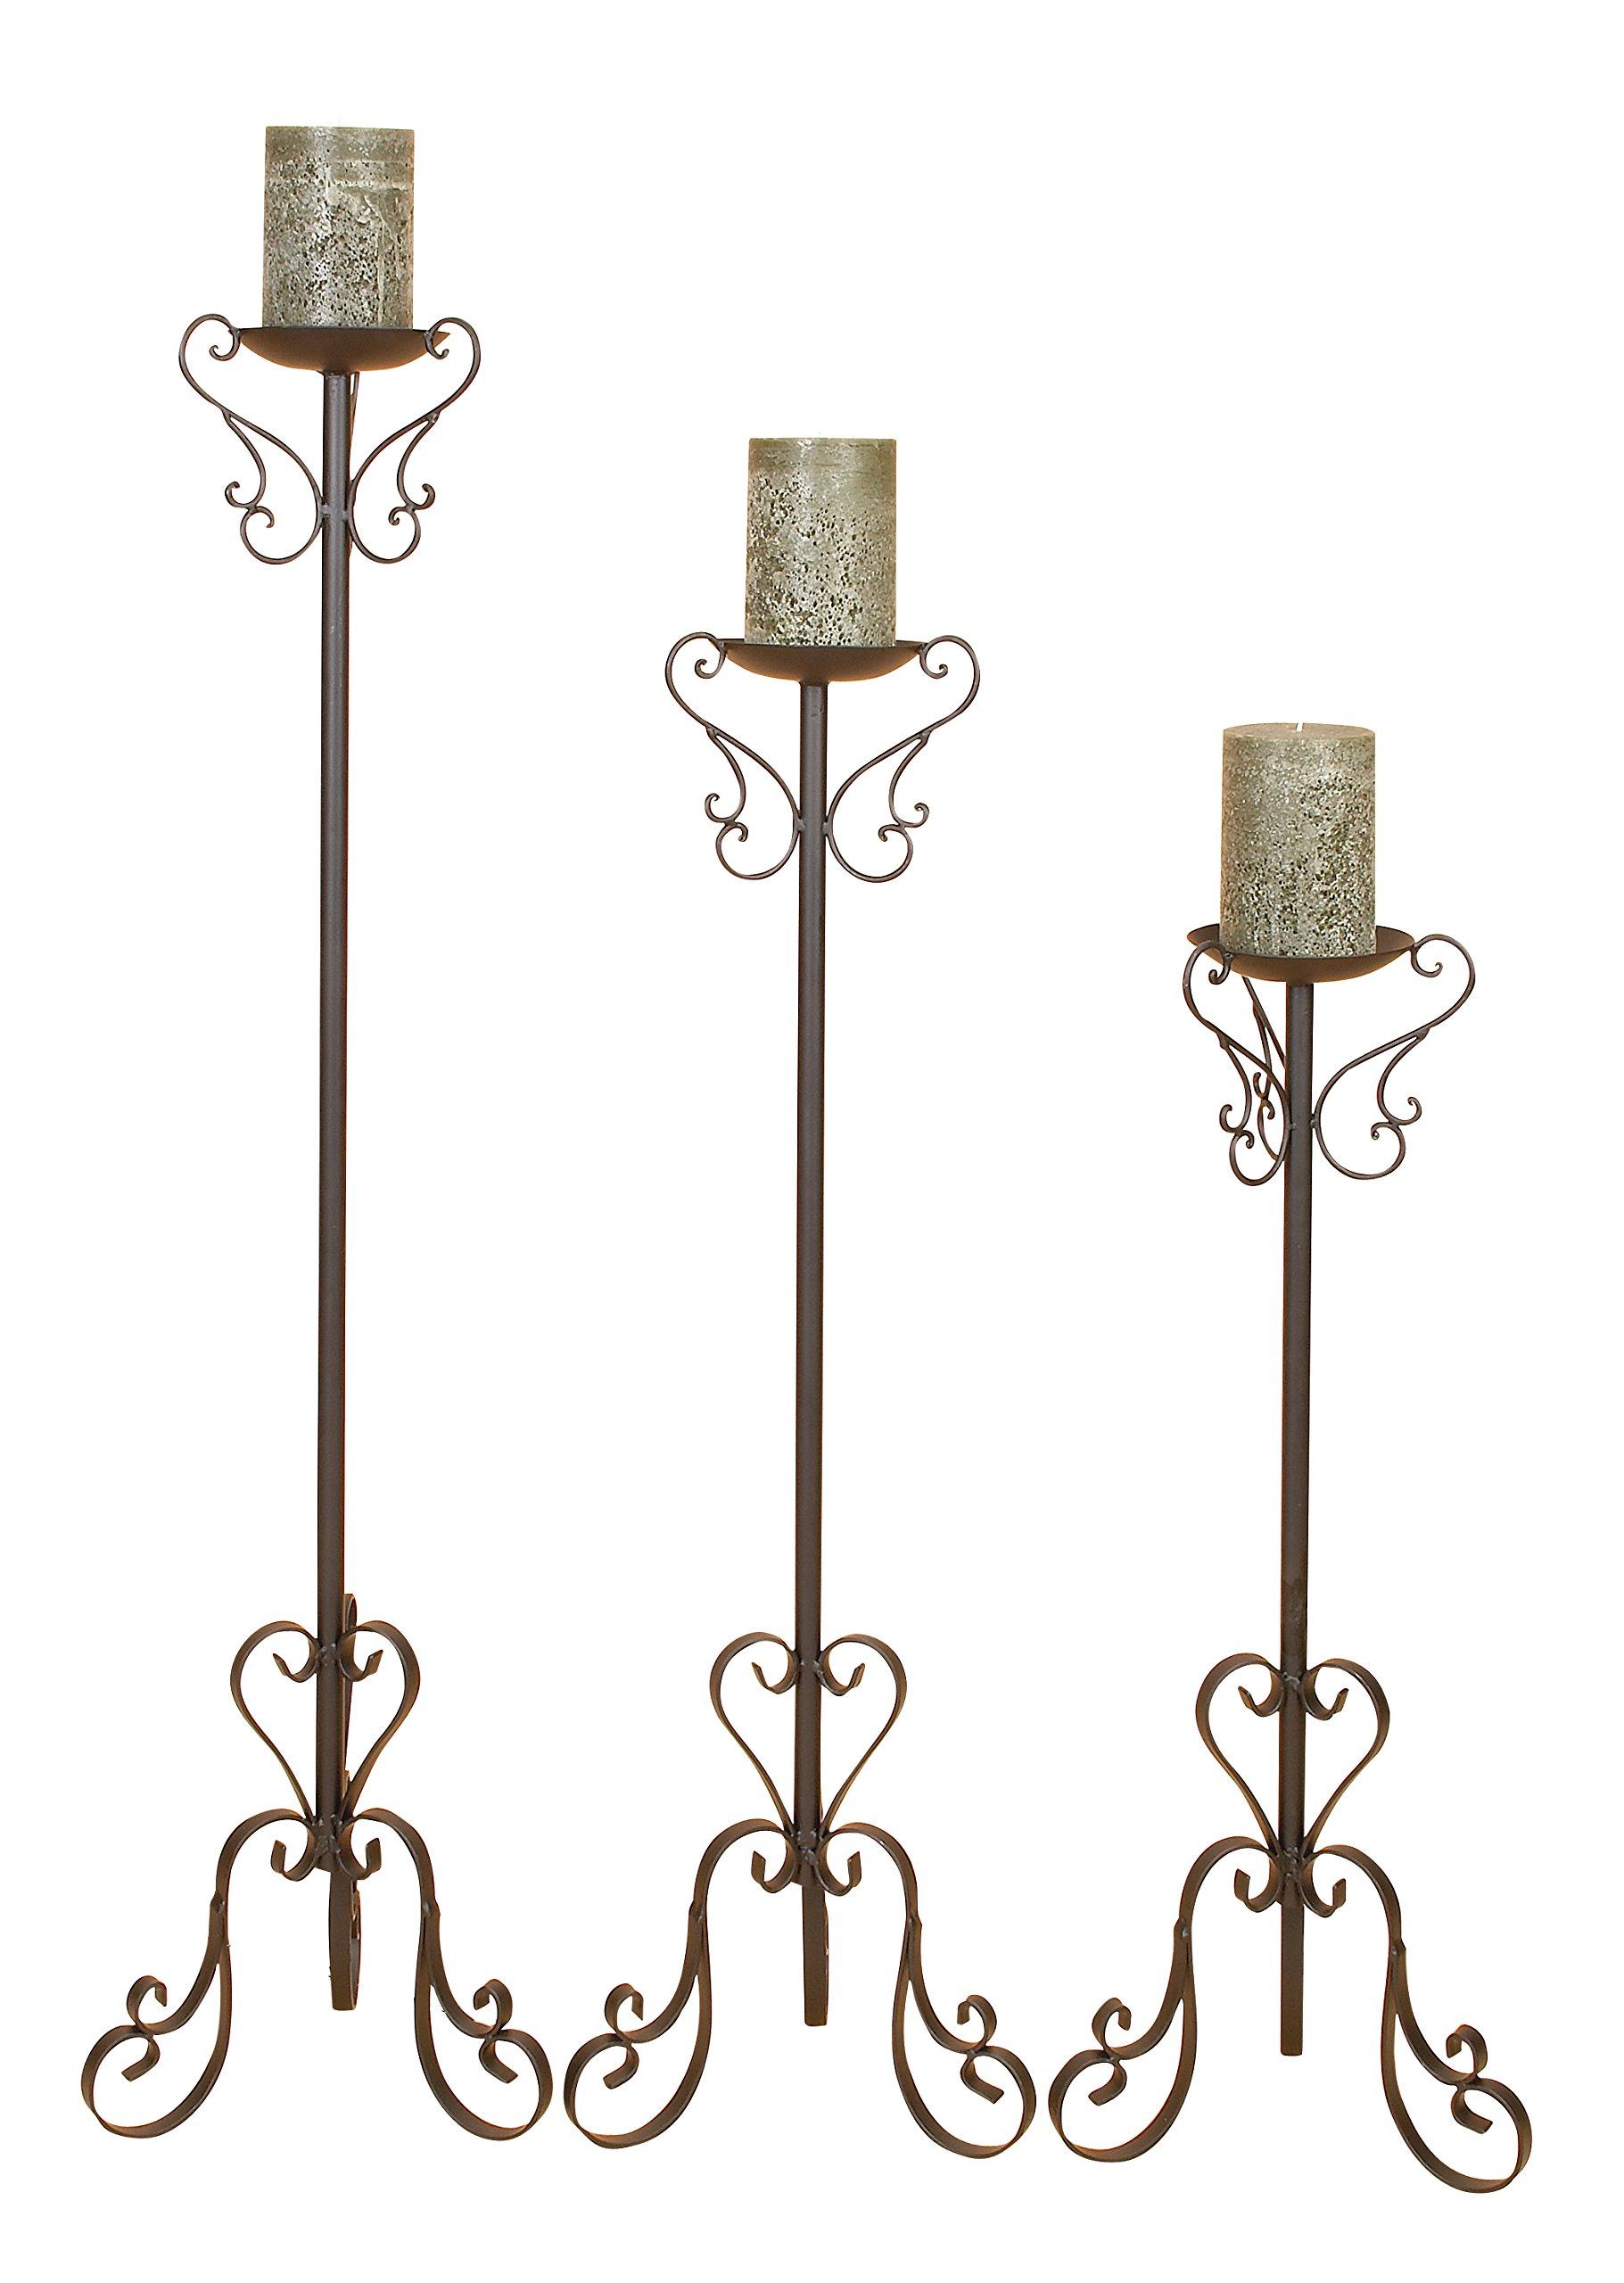 Deco 79 Tall Candle Holder Set, Black